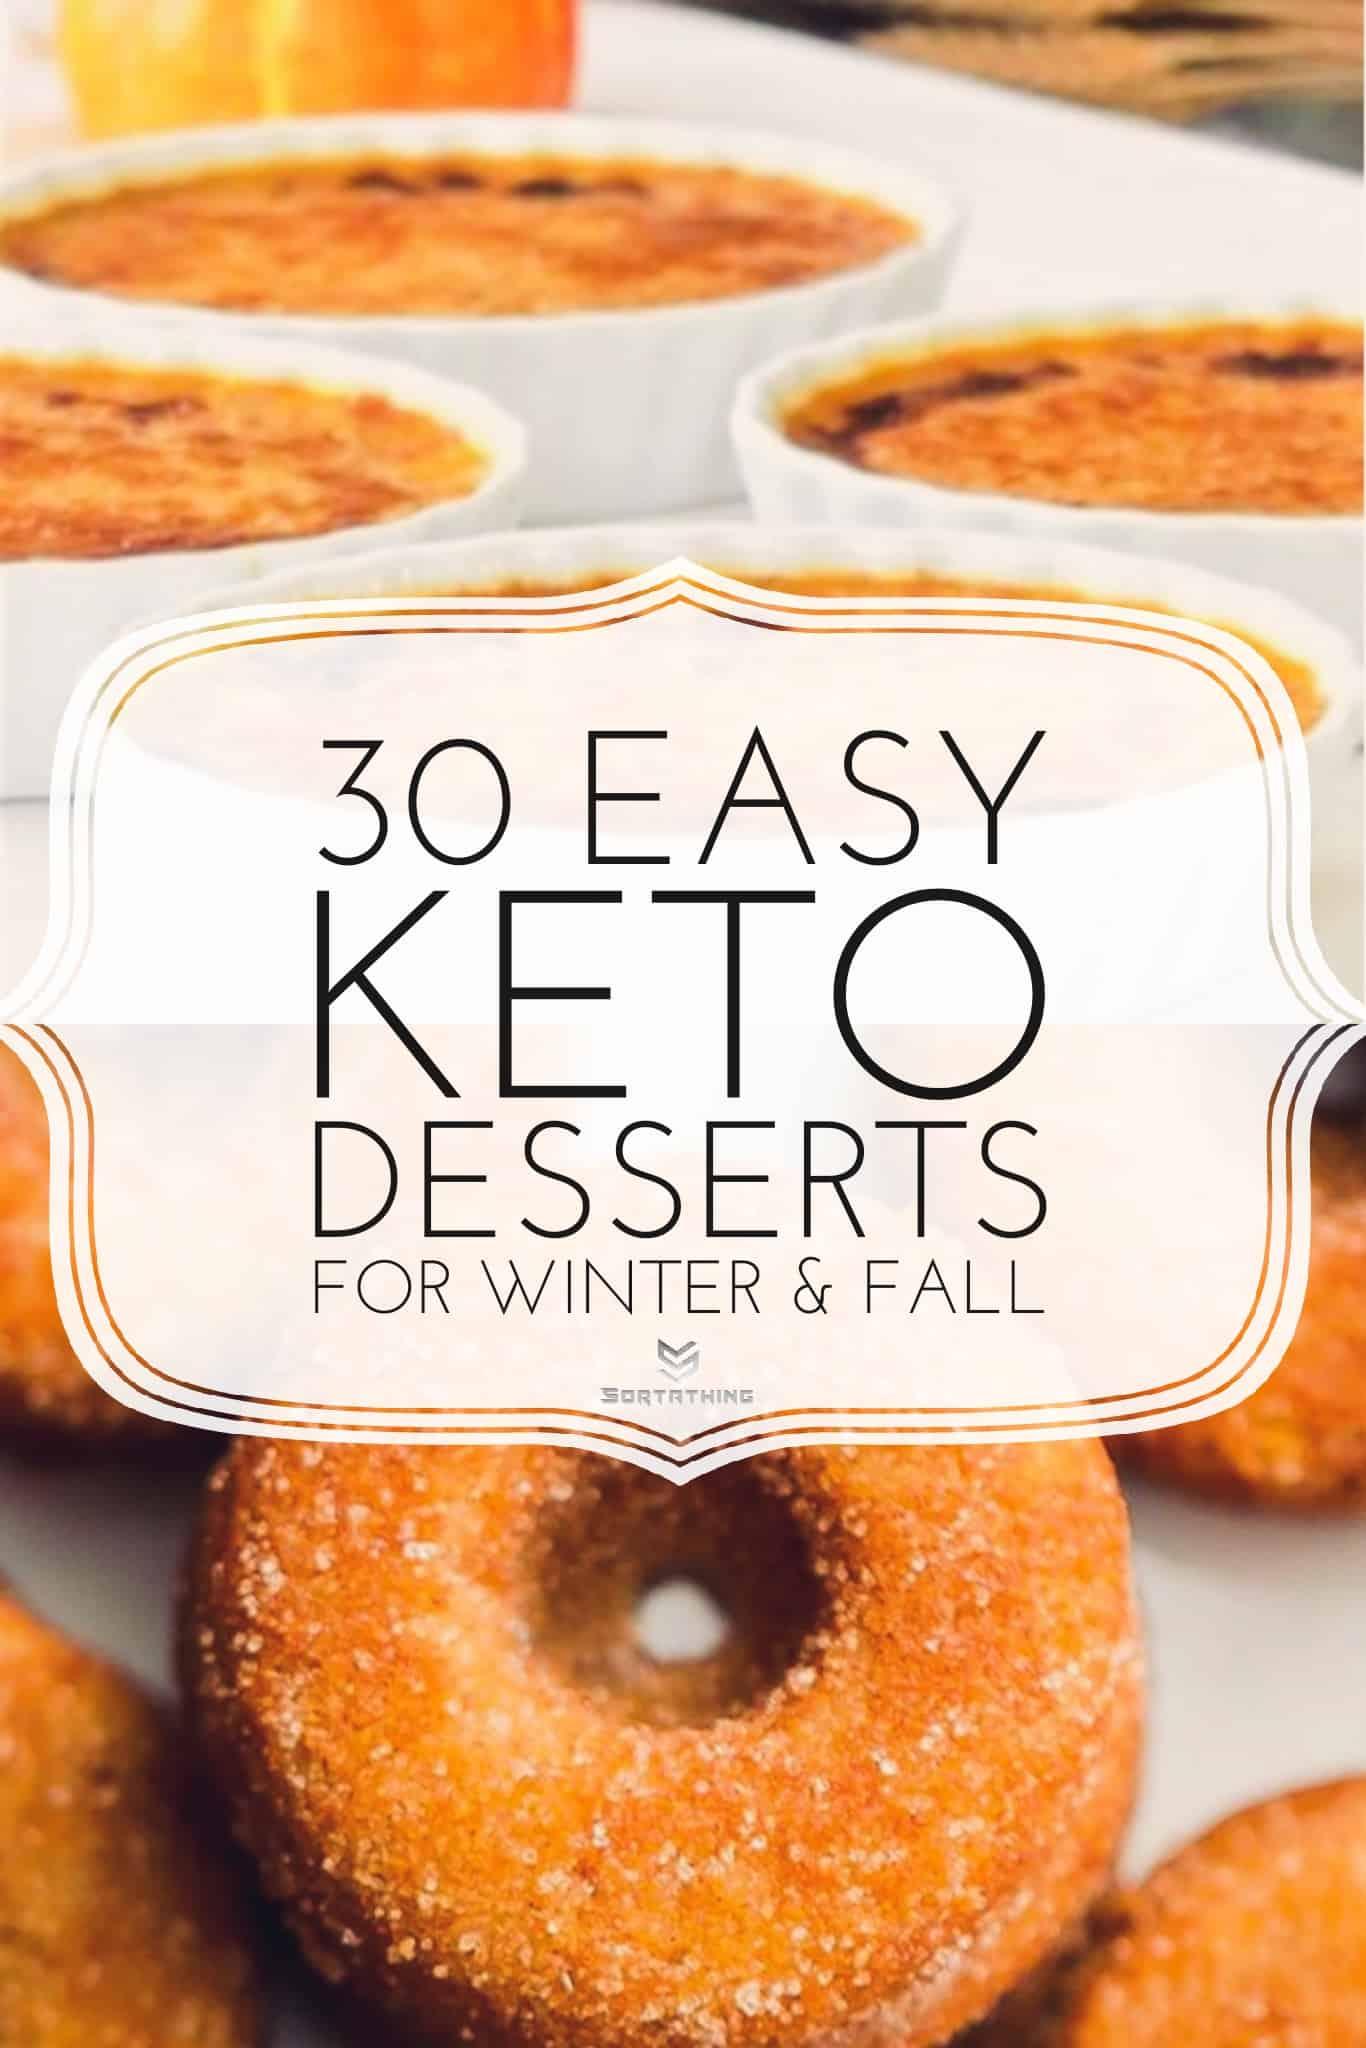 Pumpkin Spice & Bourbon Keto Crème Brûlée and Keto Pumpkin Donuts